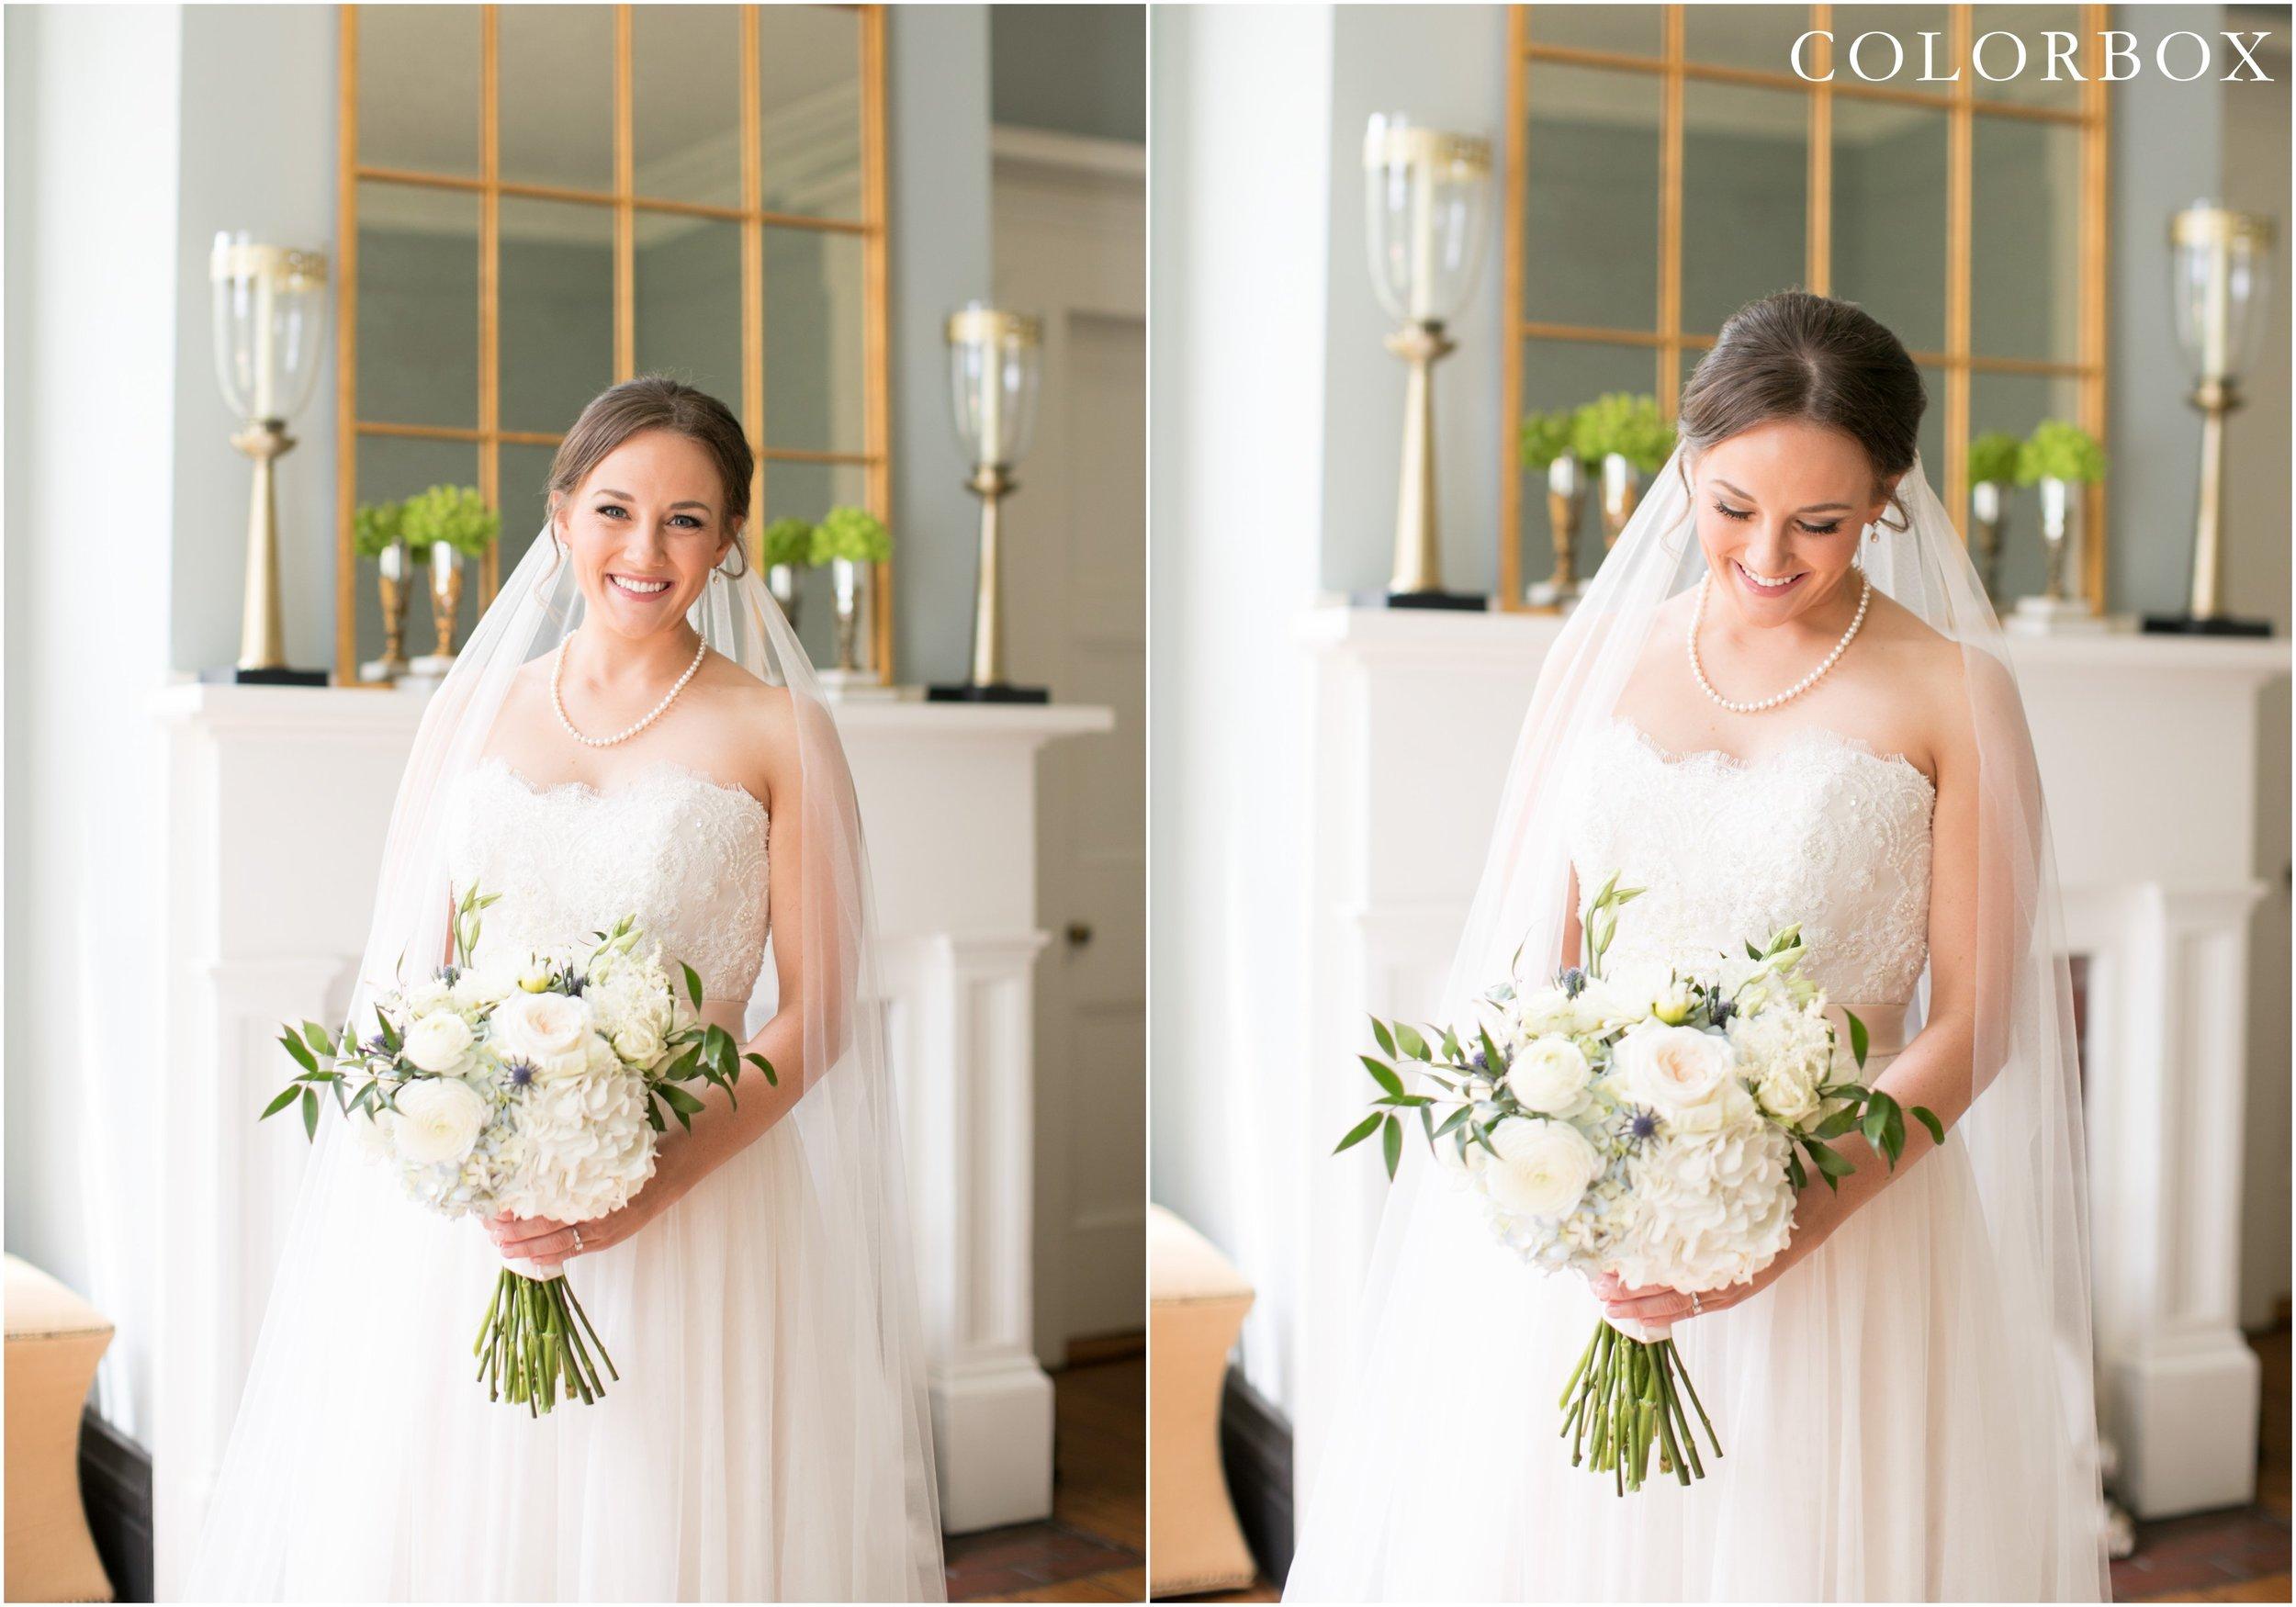 colorboxphotographers_5891.jpg